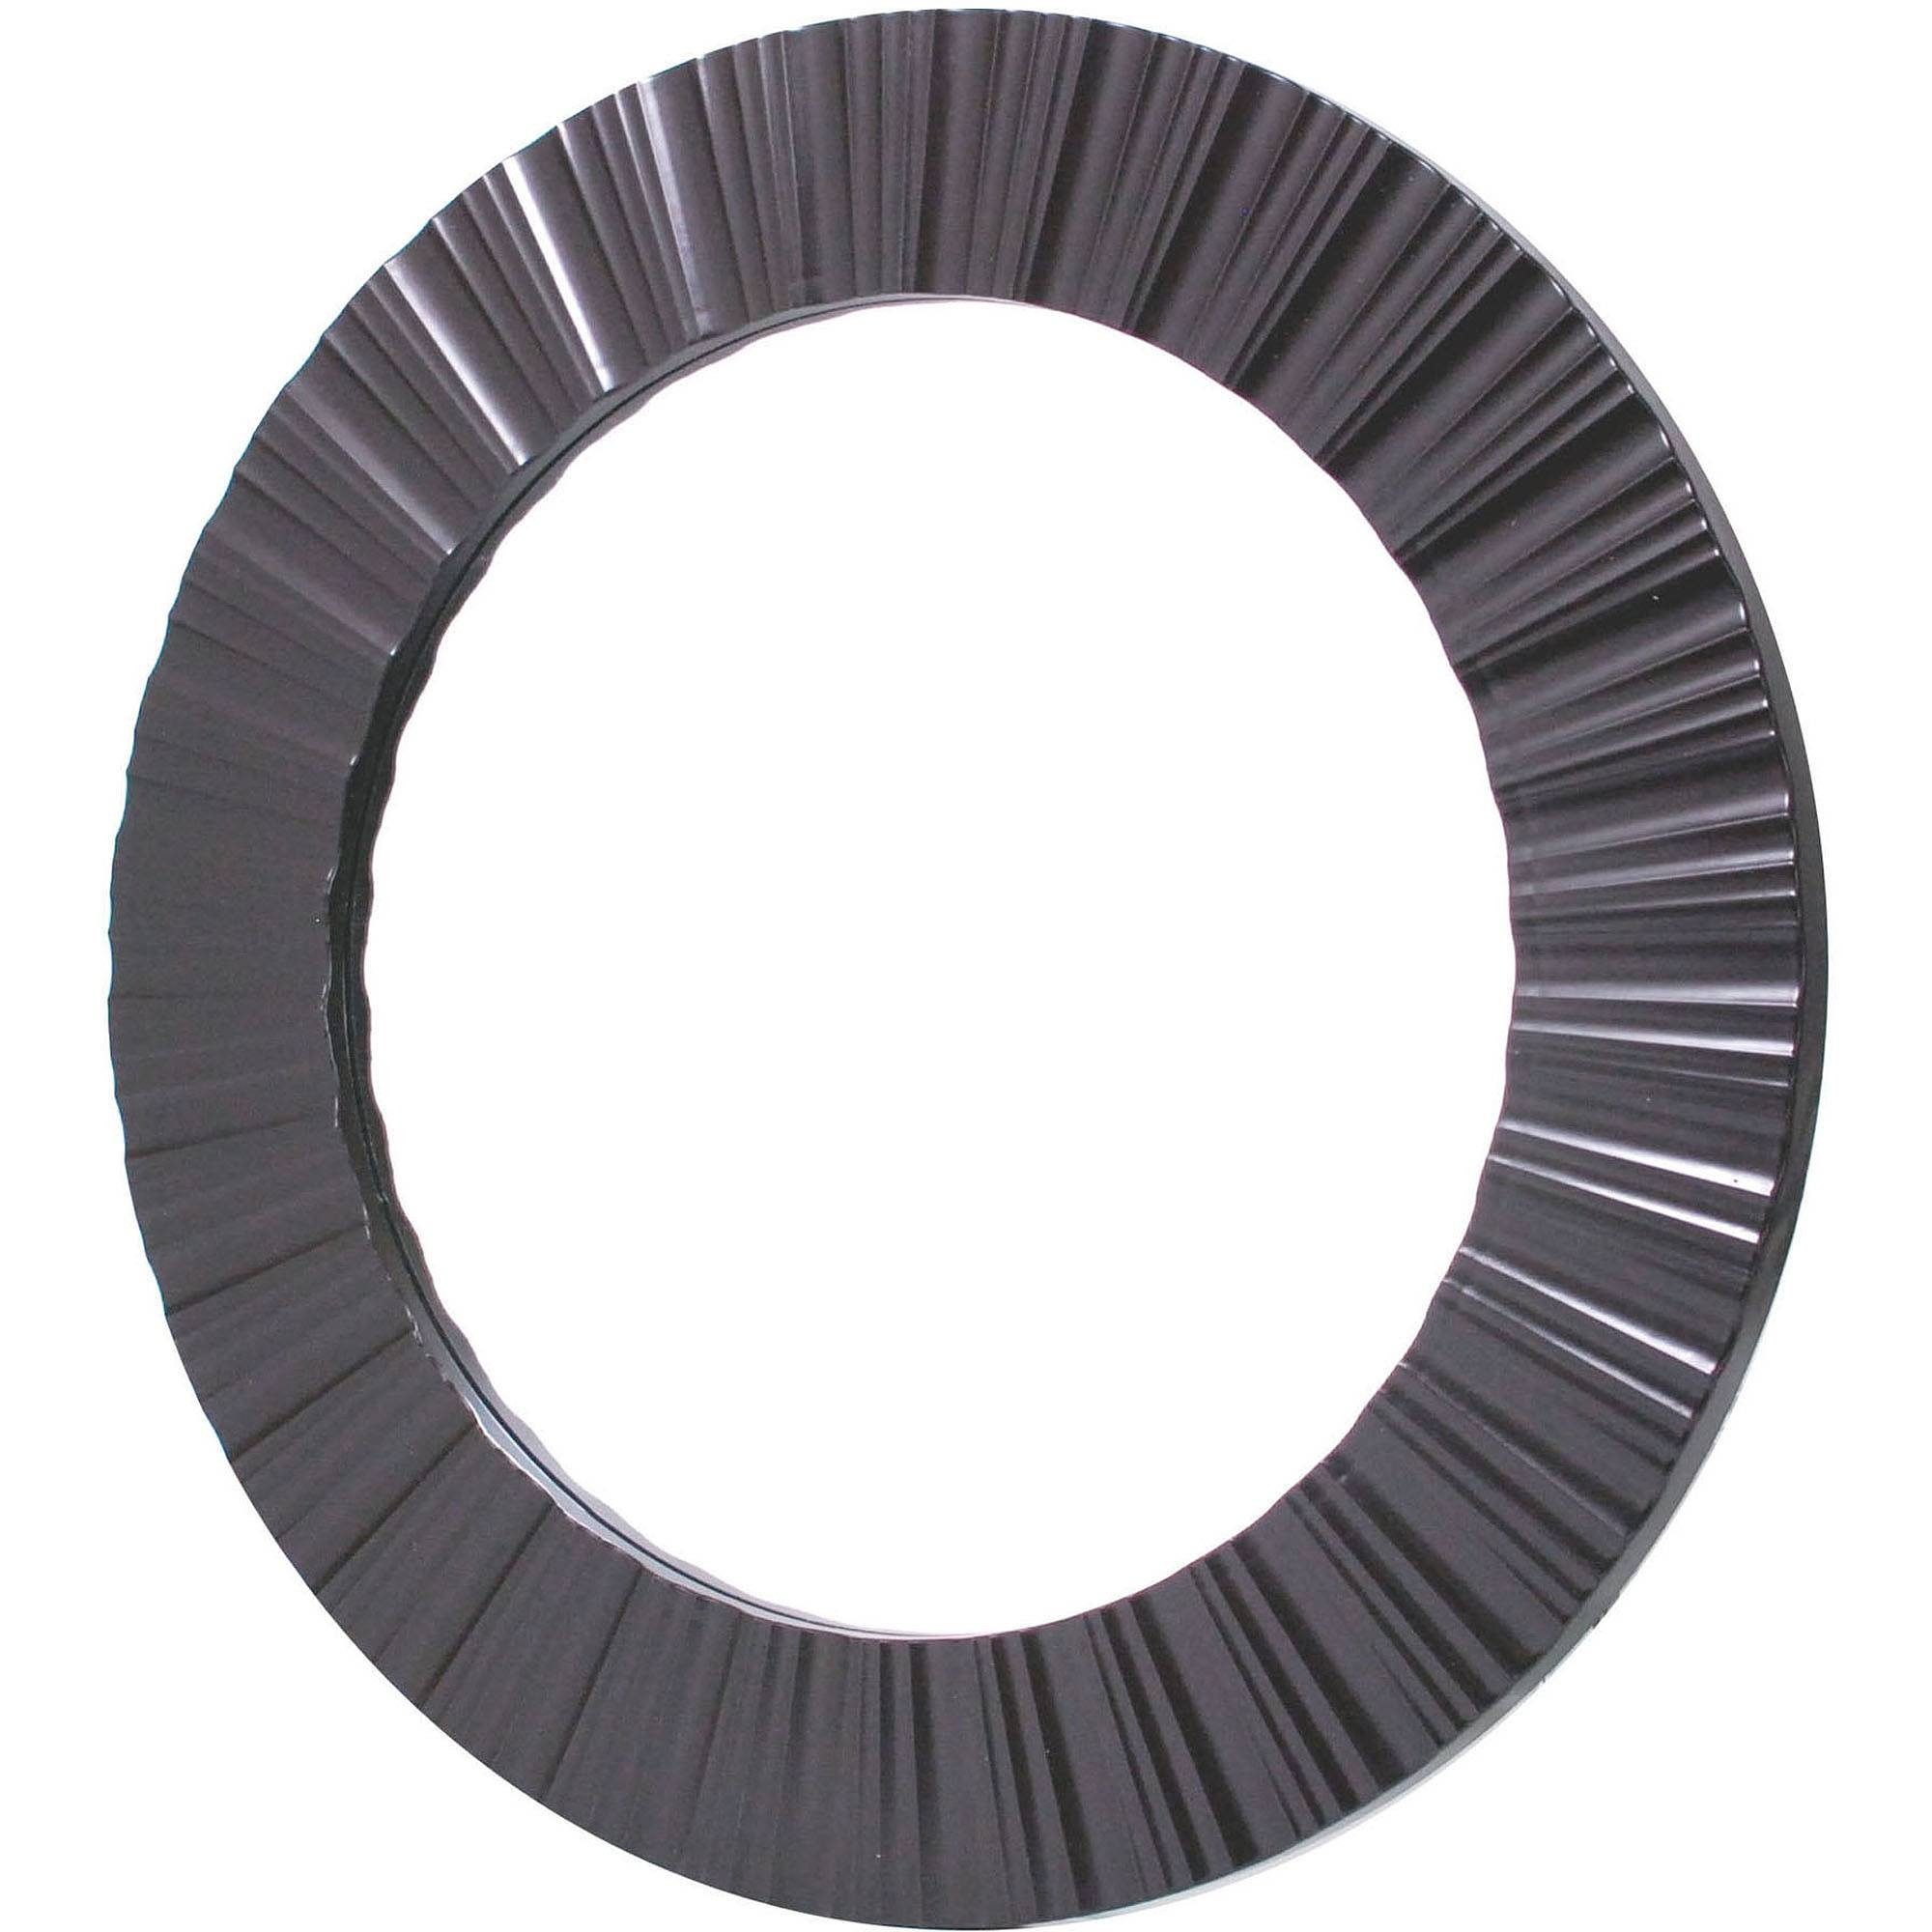 Large Round Mirrors Throughout Large Circular Mirrors (View 11 of 25)